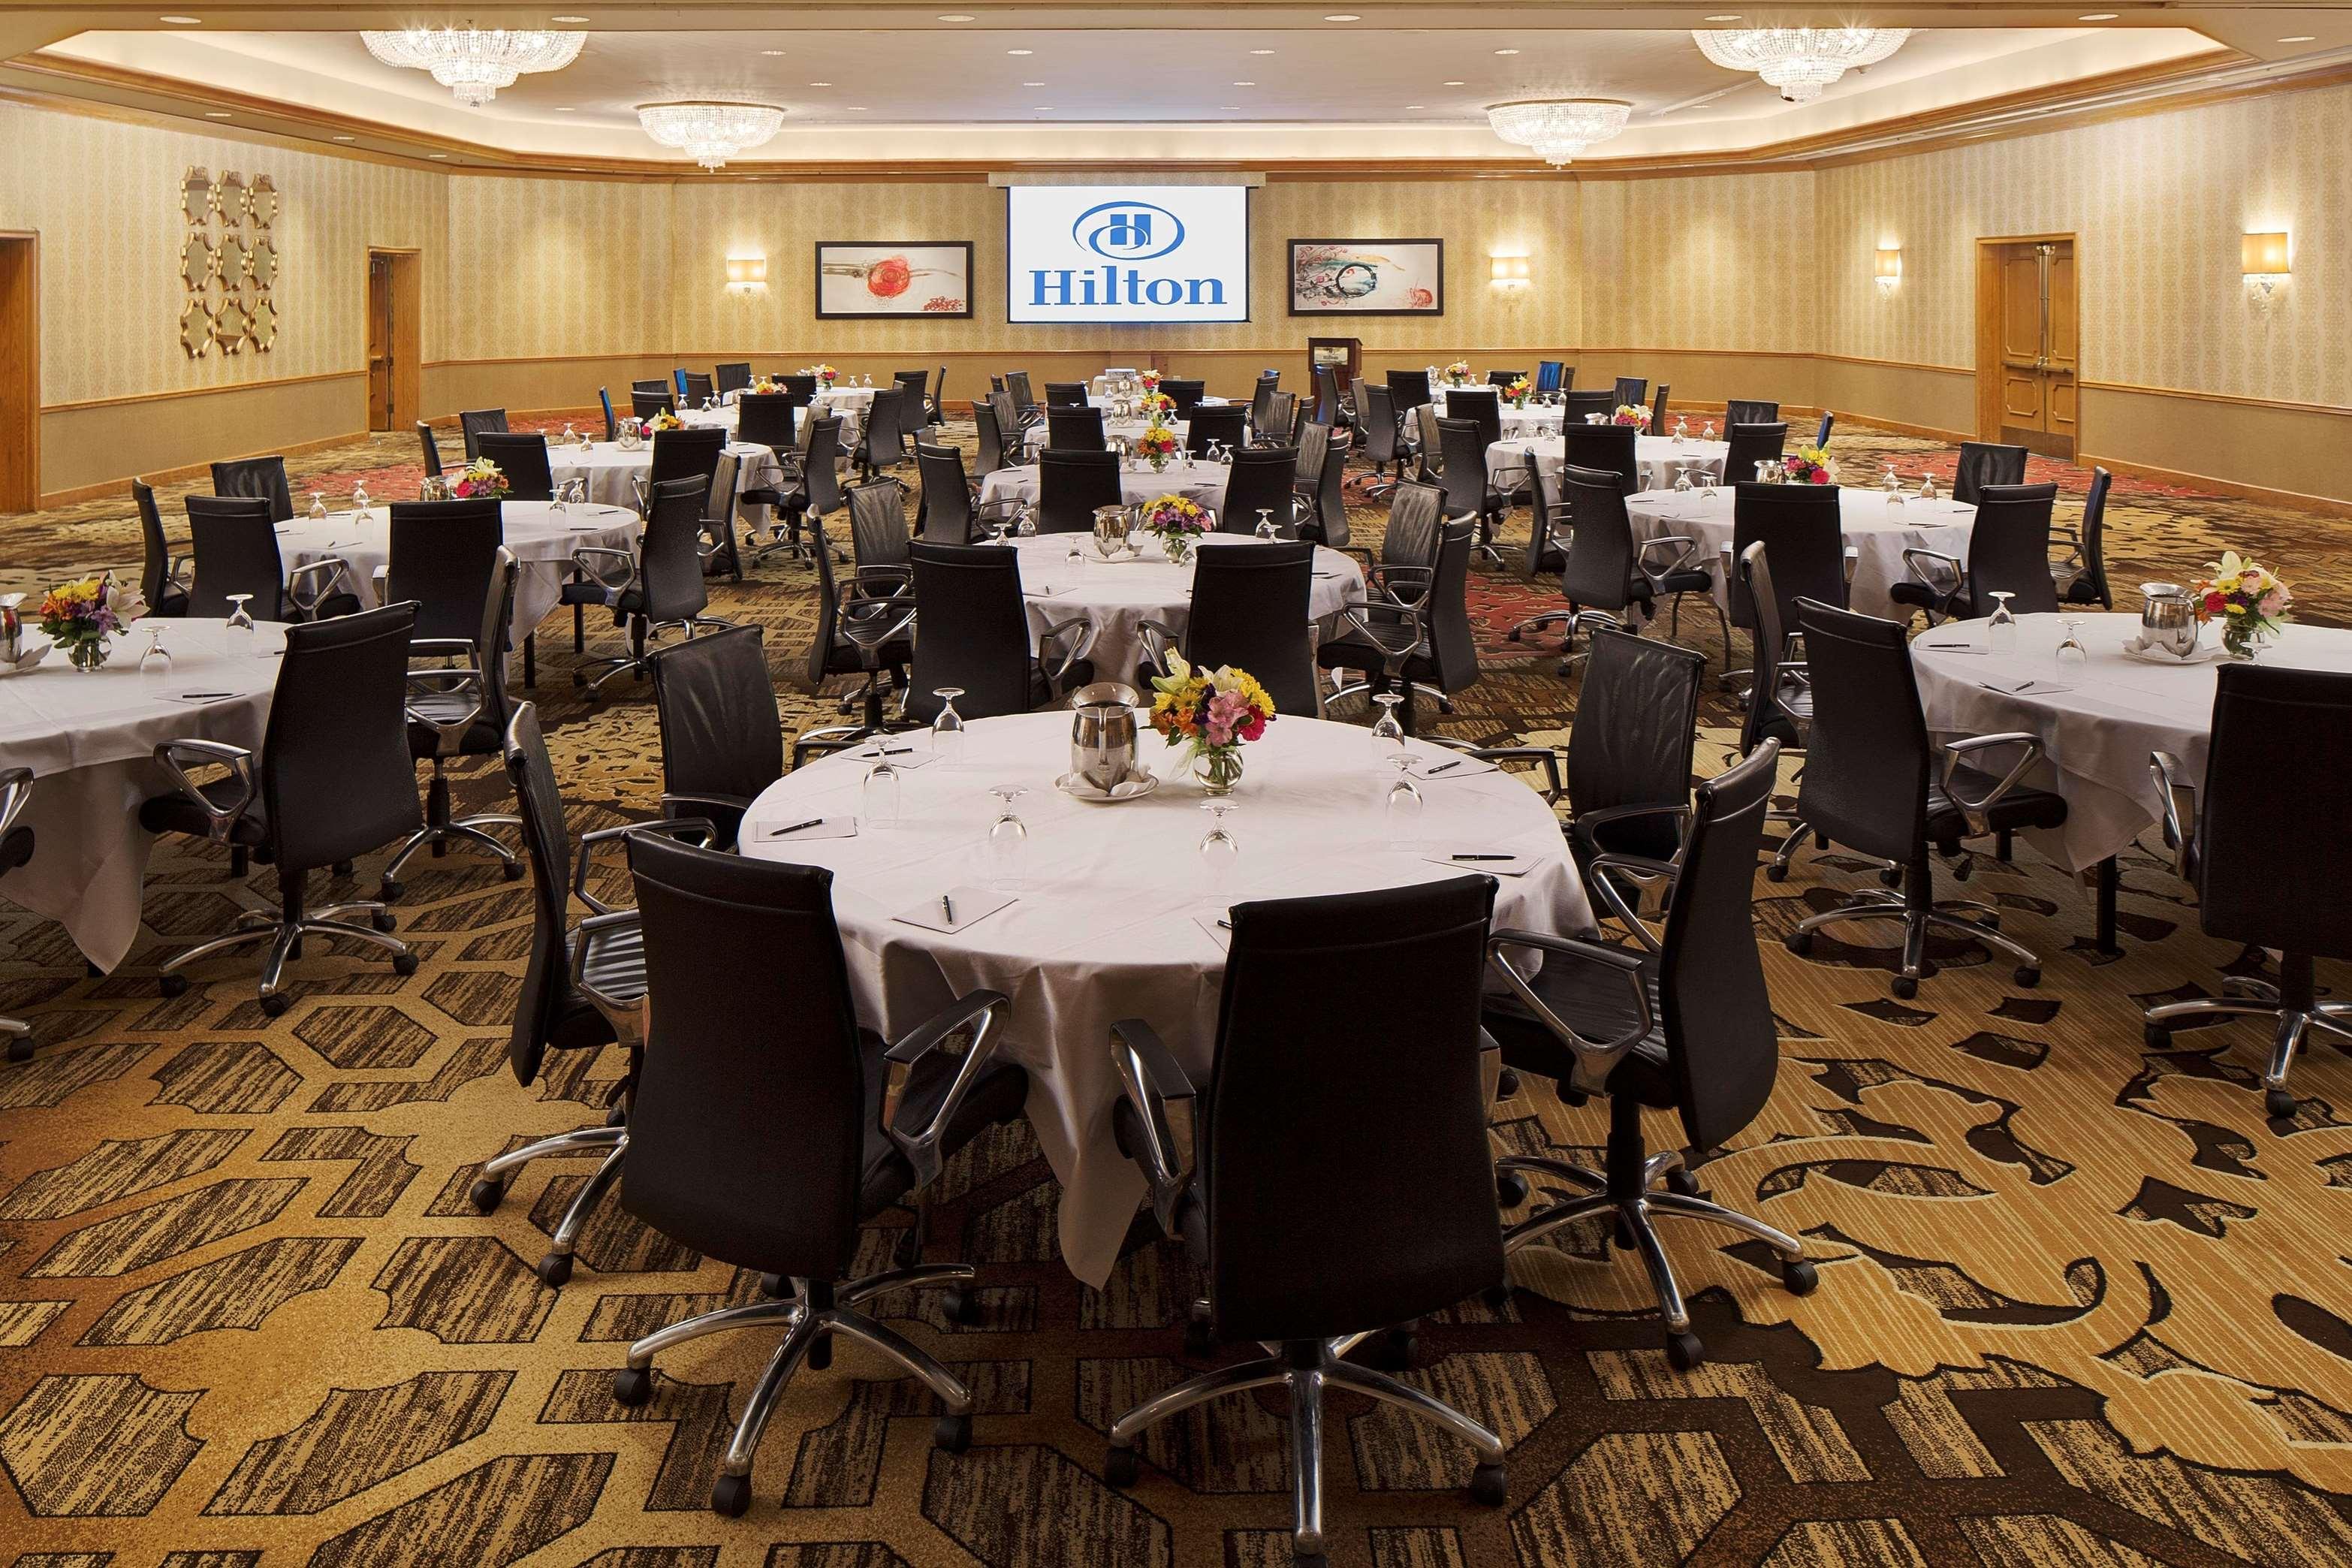 Hilton Rosemont/Chicago O'Hare image 20